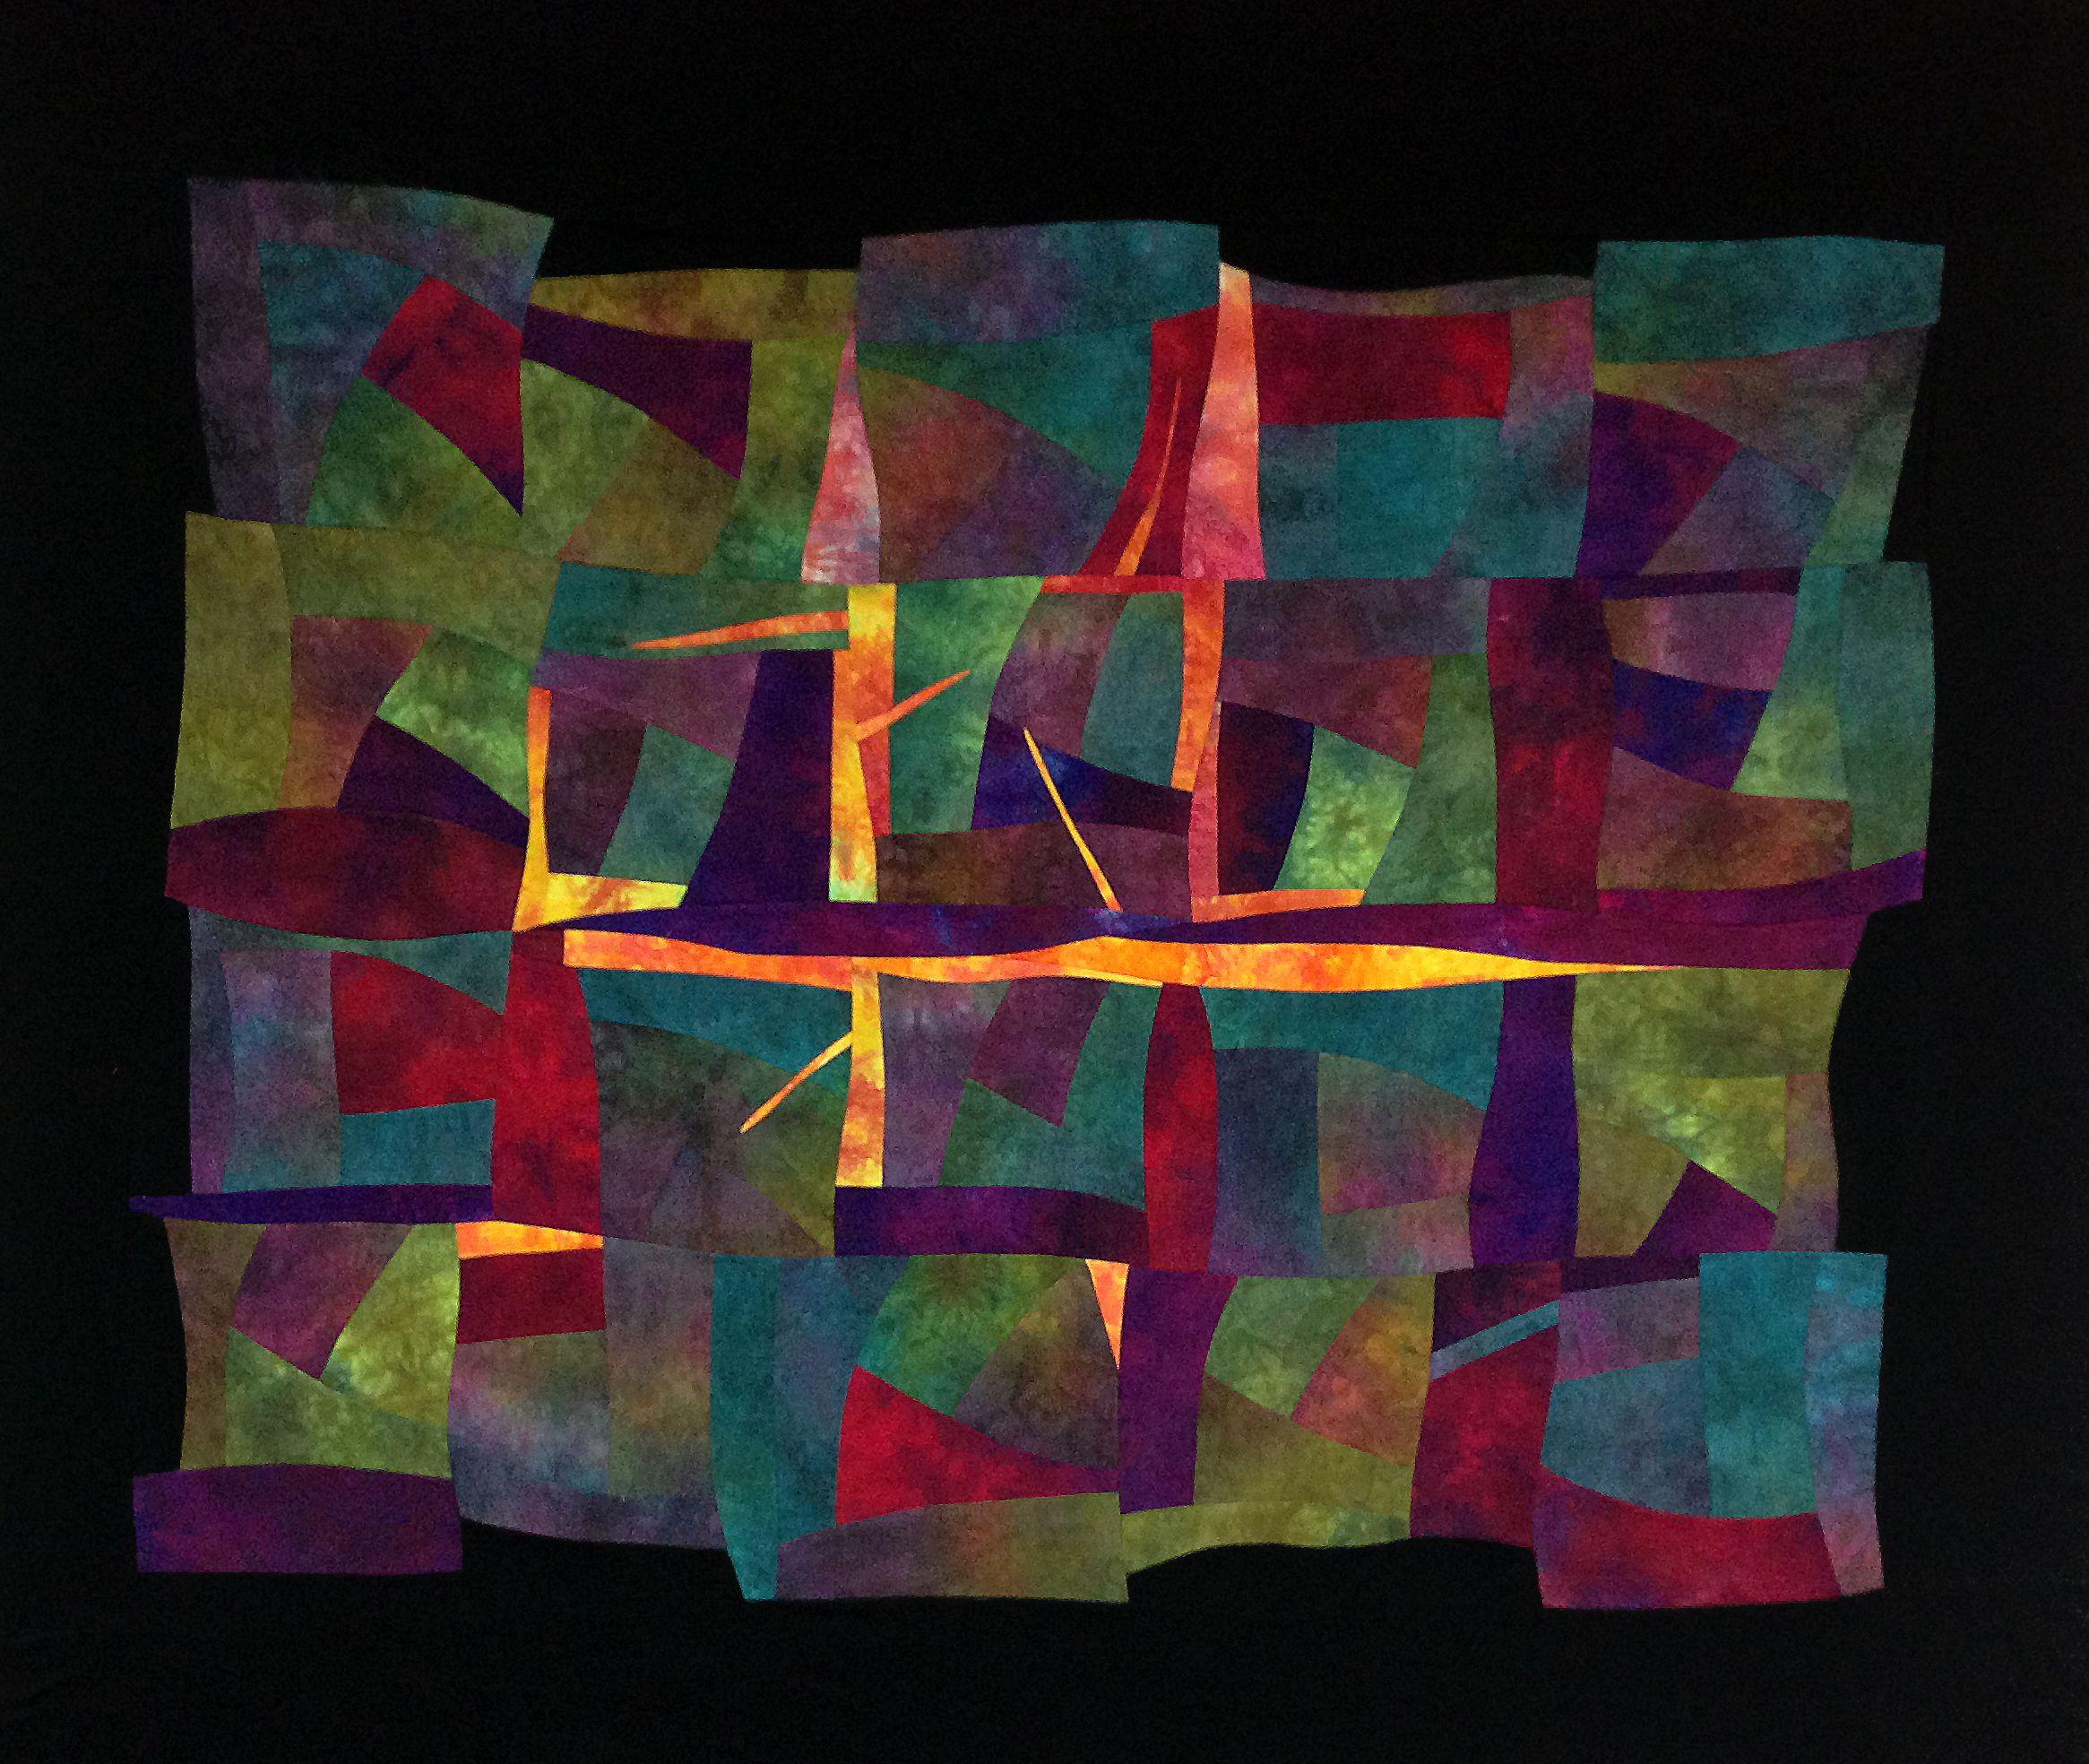 Color art dubai - Fabric Art